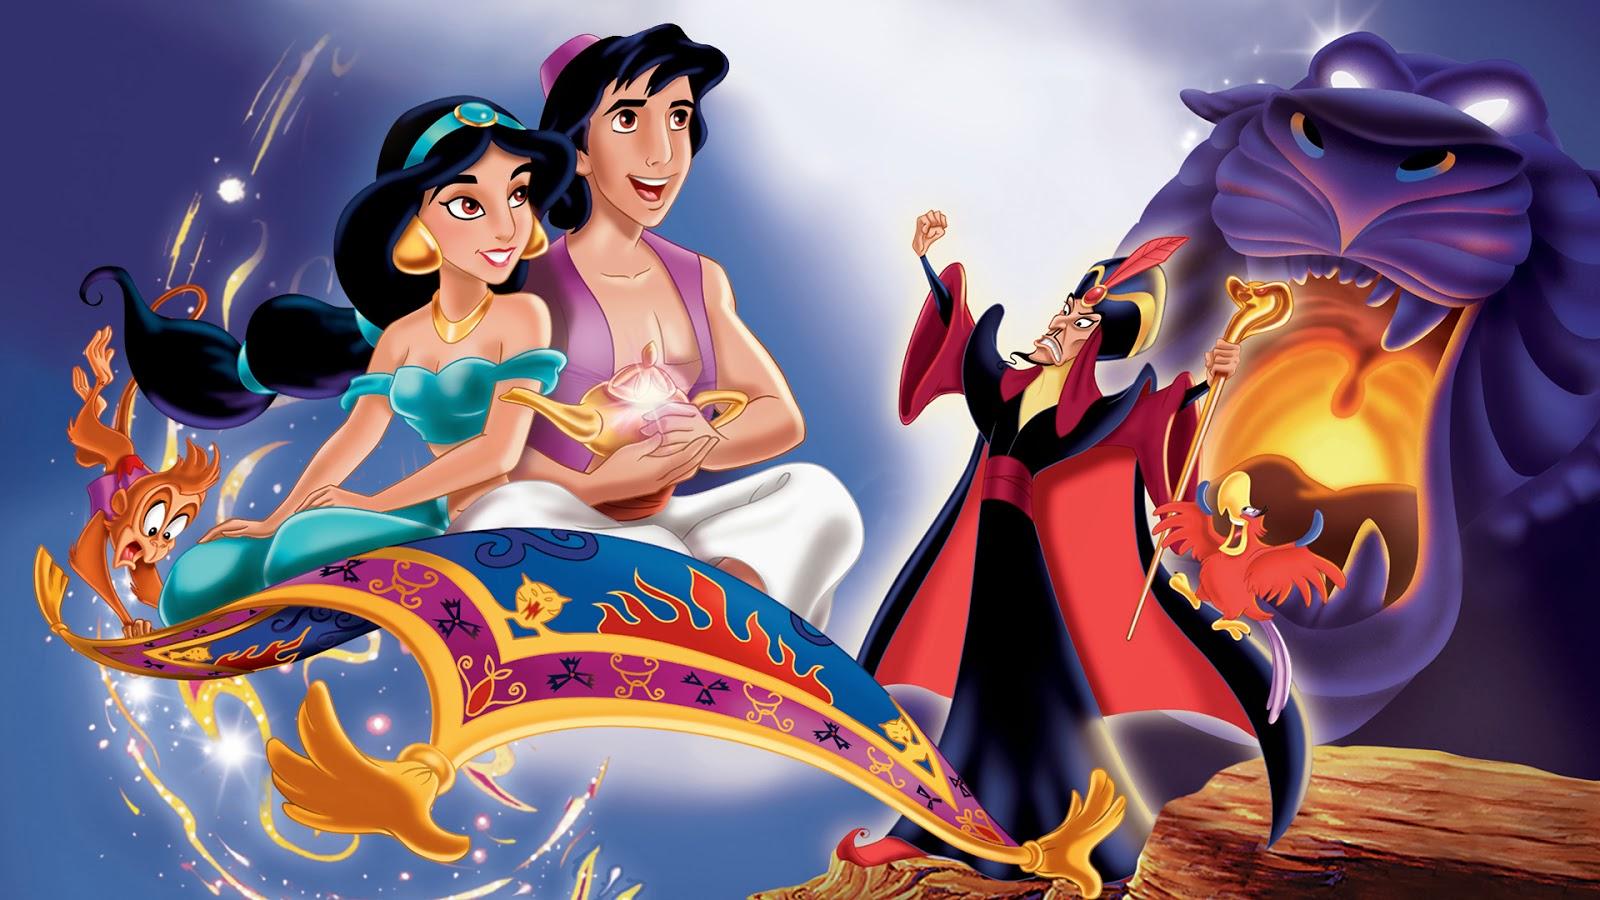 Disney Movies Hd Wallpapers: Disney HD Wallpapers: Aladdin HD Wallpapers